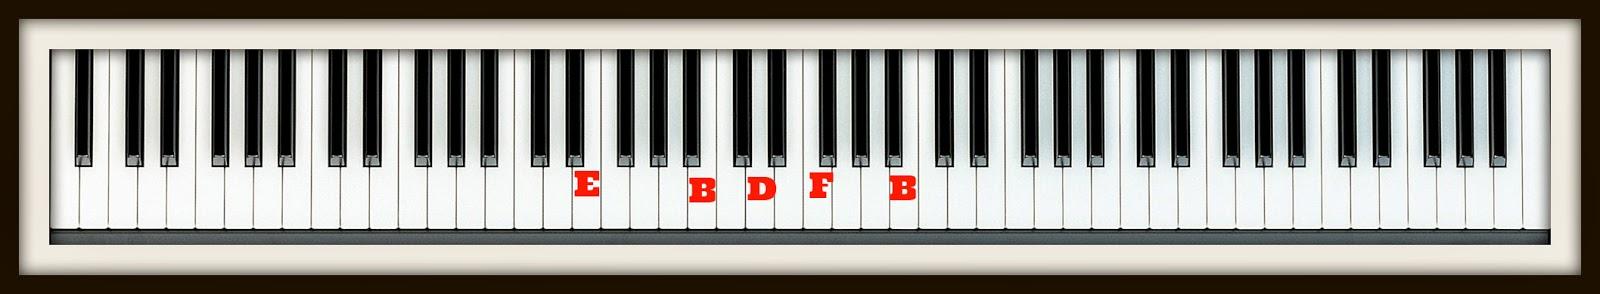 Music Secrets Blog Bill Evans Chord Progression